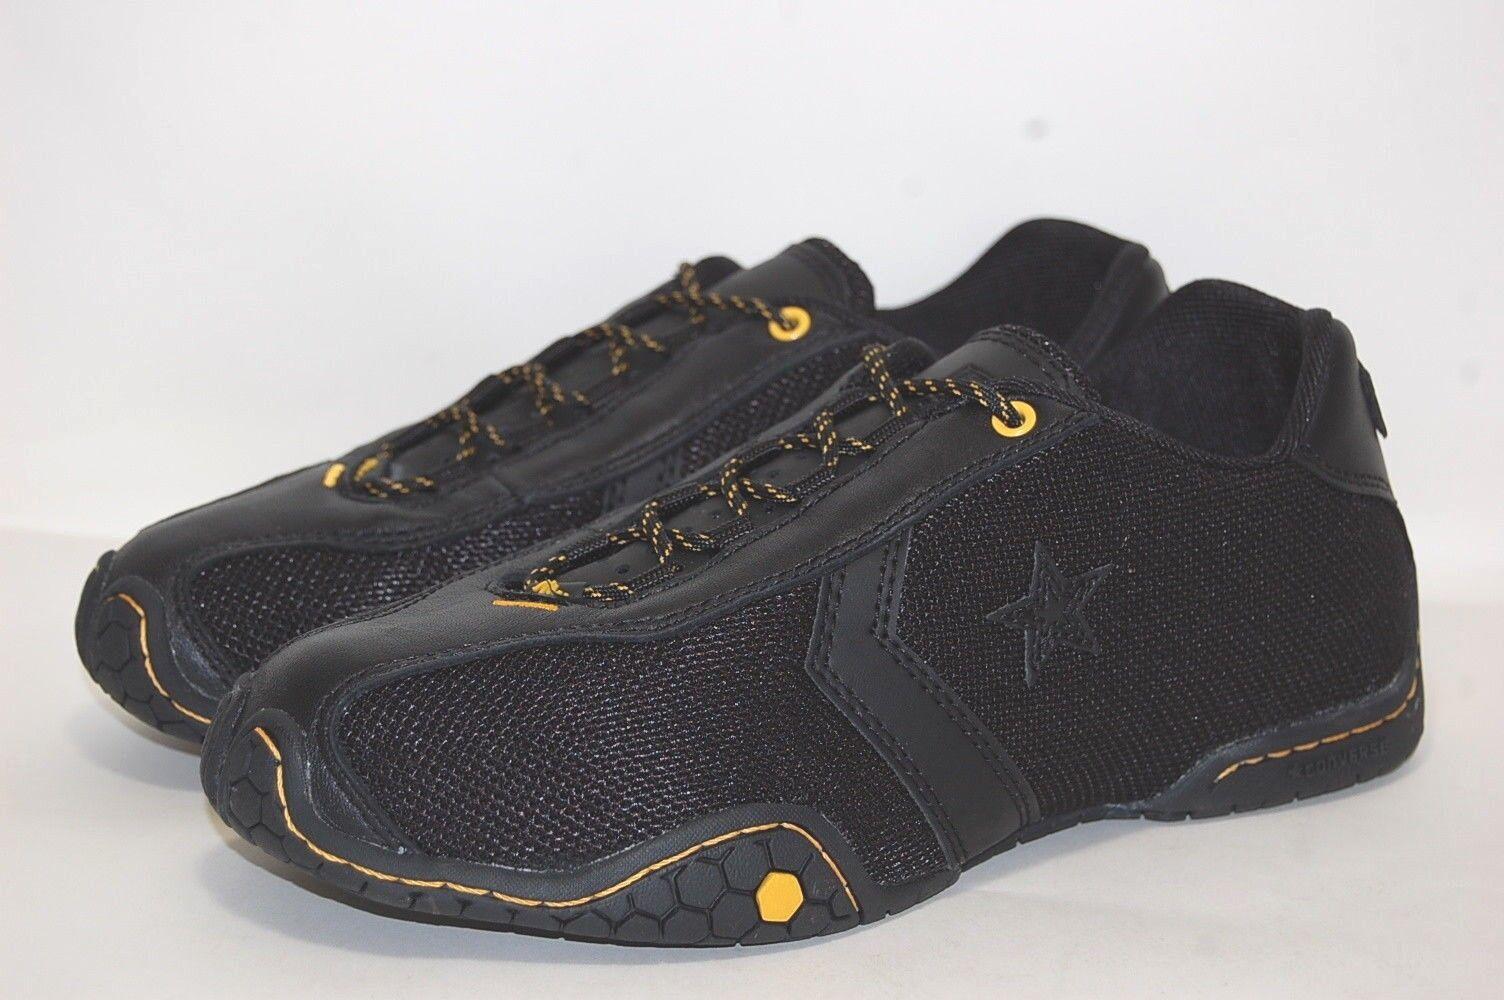 converse catch 22 ox 1q929 1q929 ox noir jaune chaussures femmes 99827c